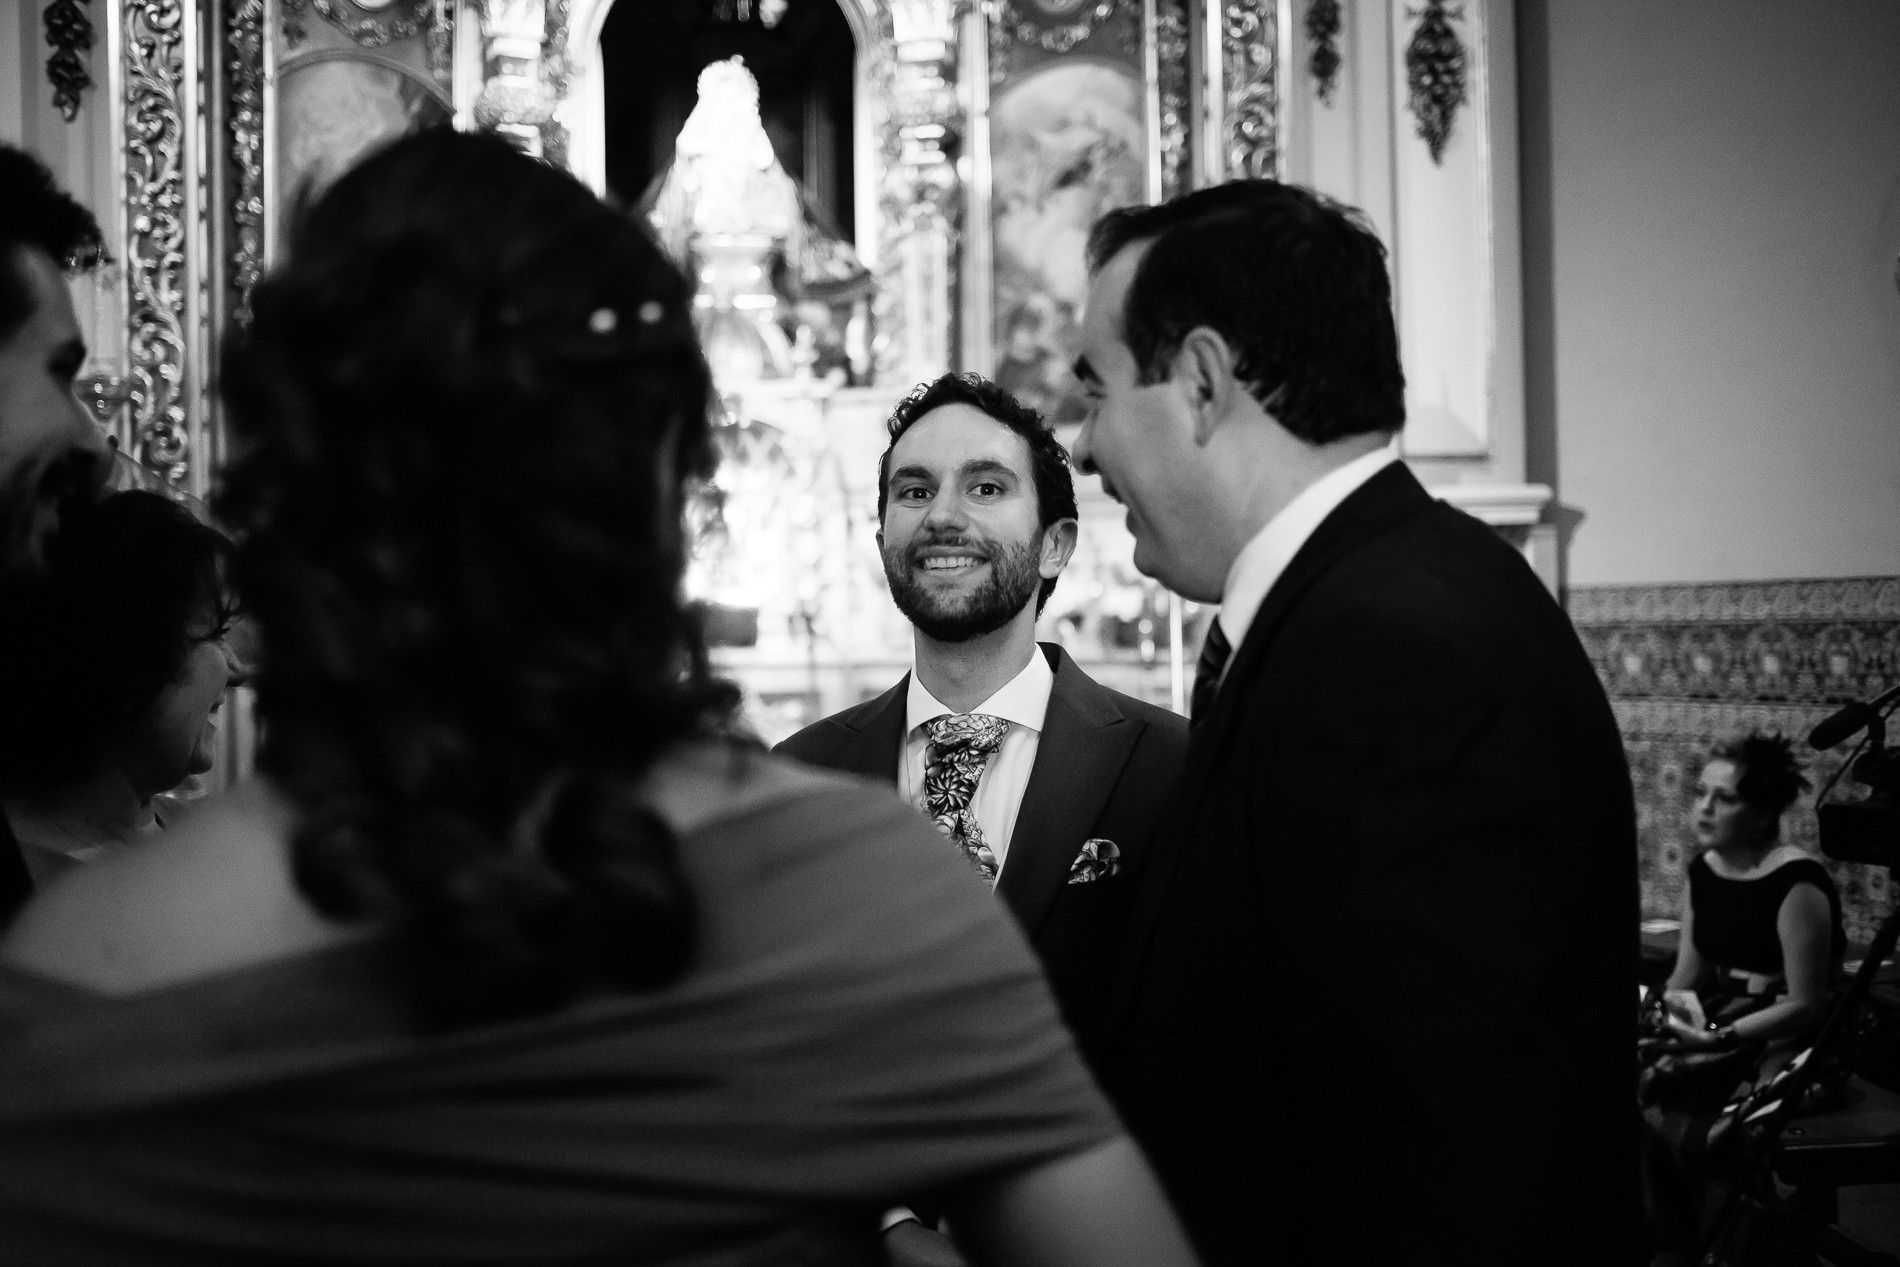 fotografo-de-boda-plasencia-14